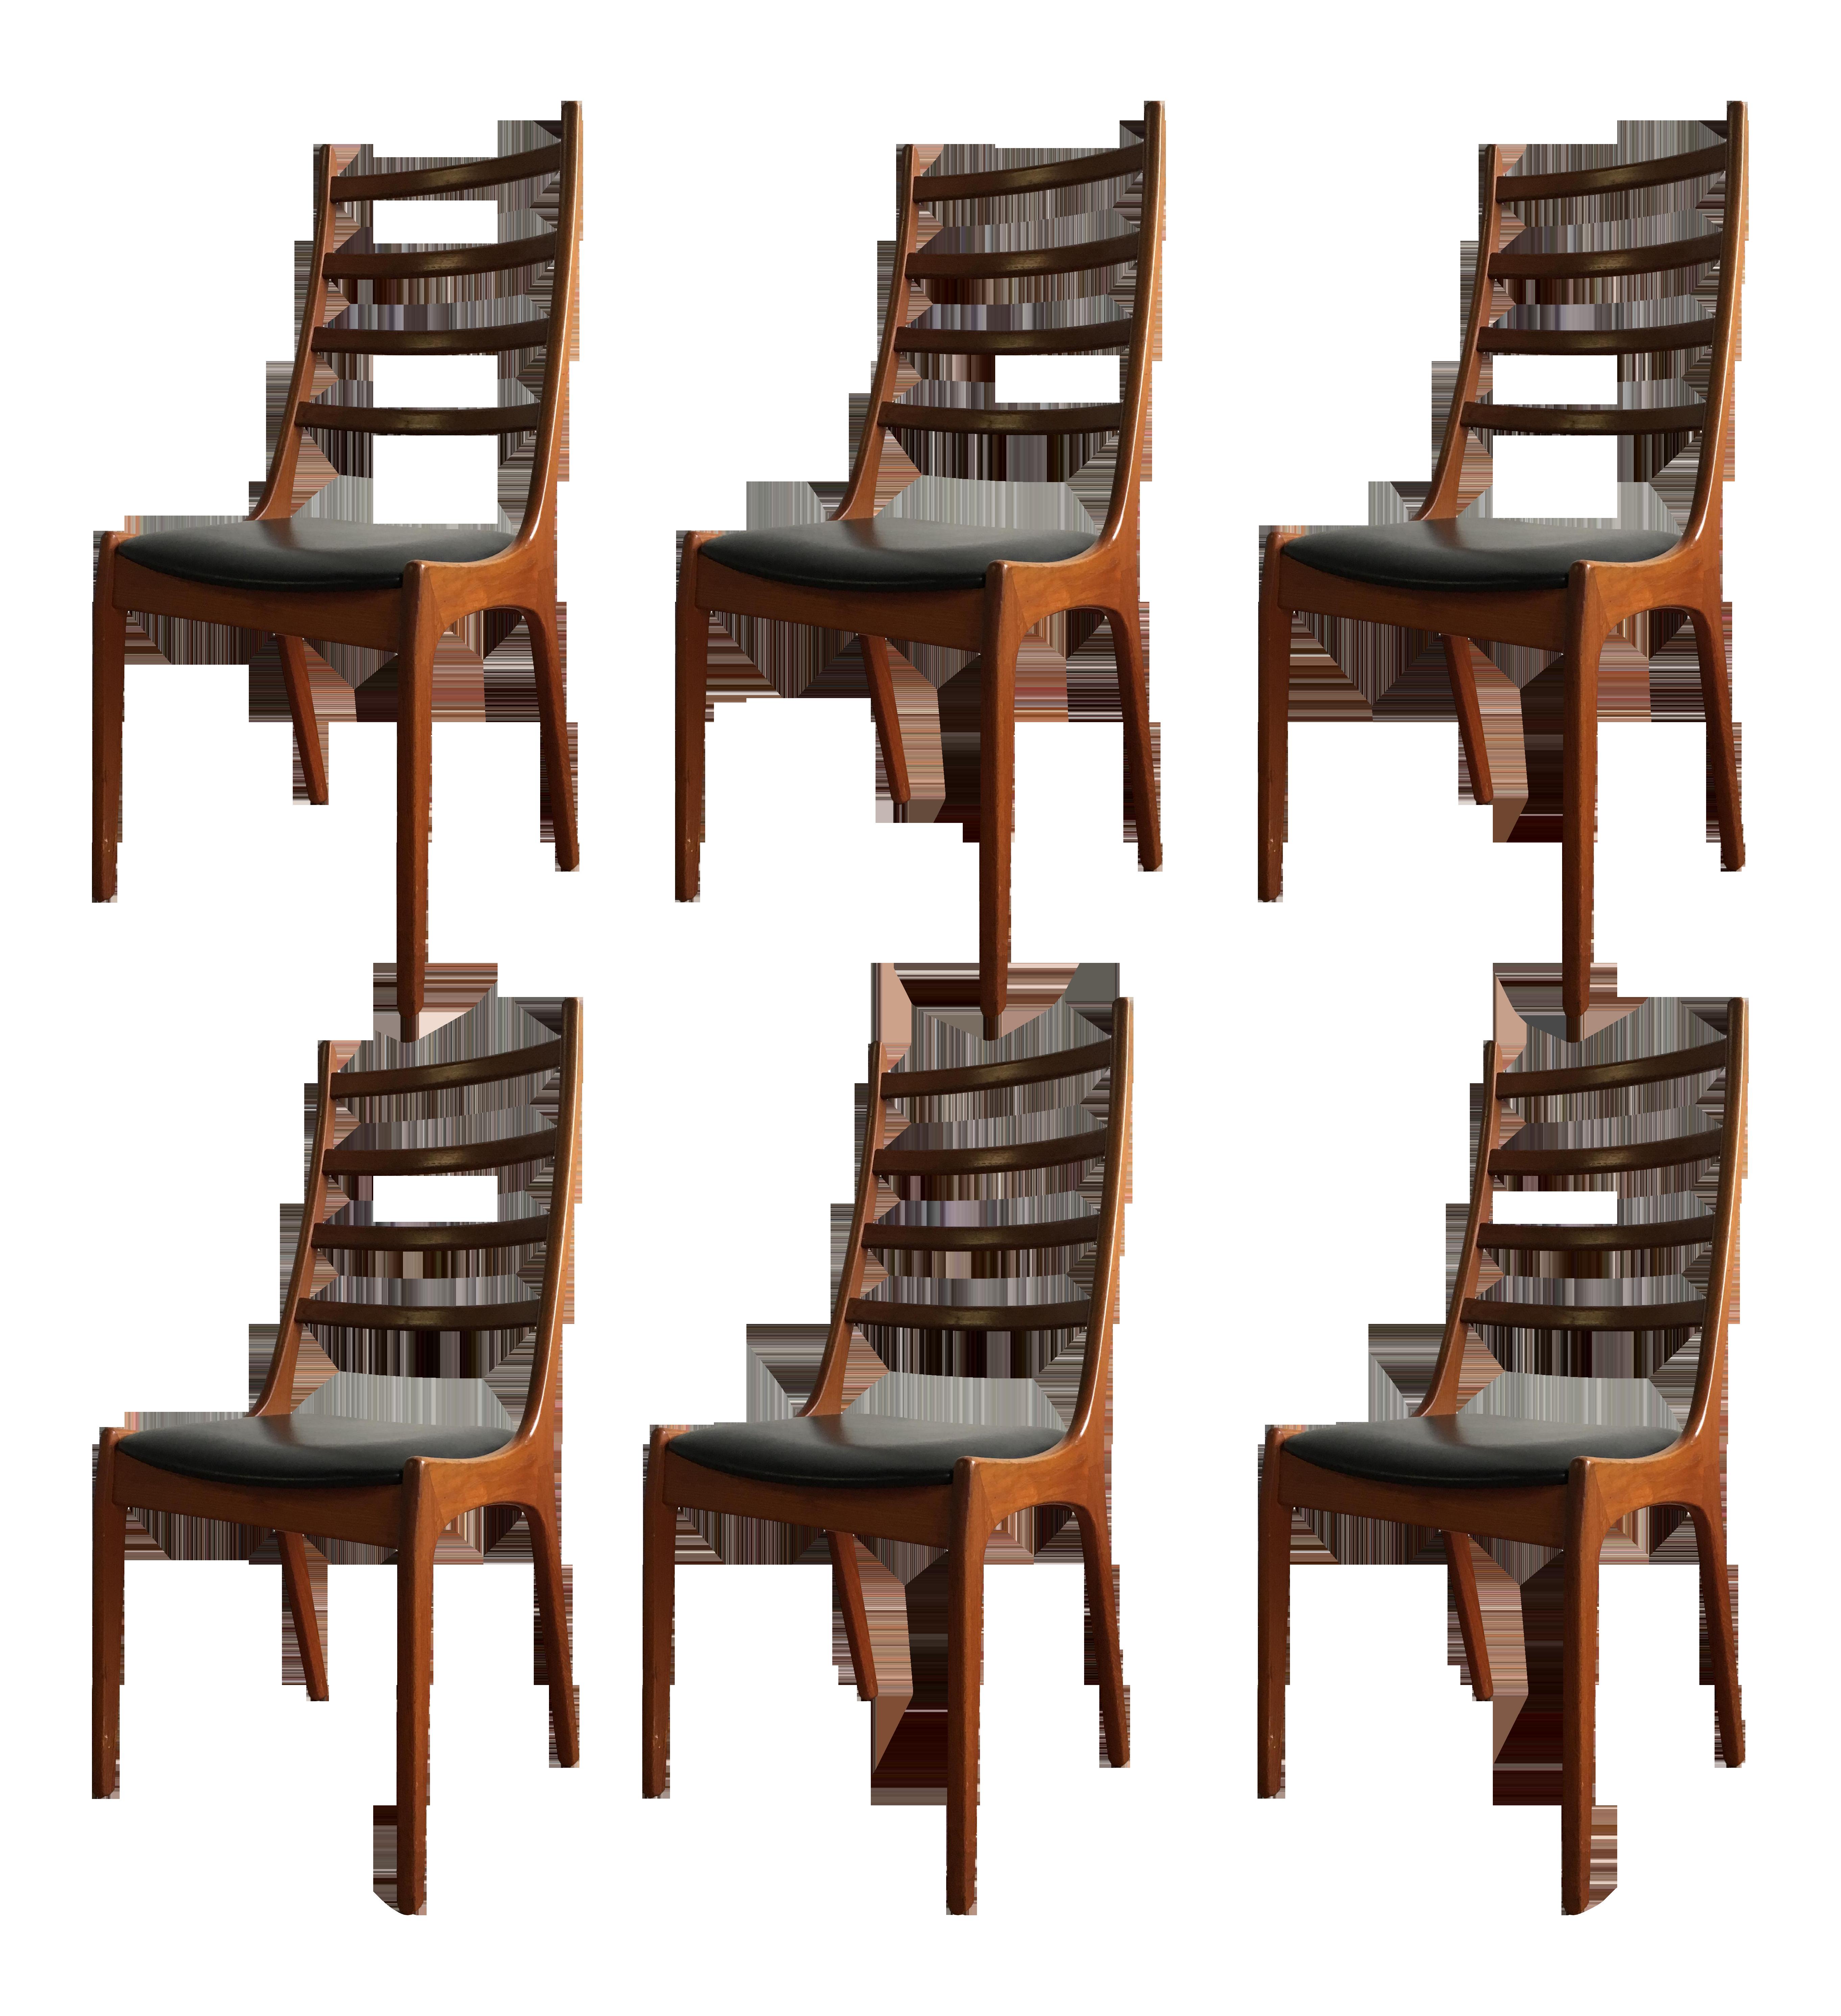 kai kristiansen ladder back dining chairs set of 6 chairish